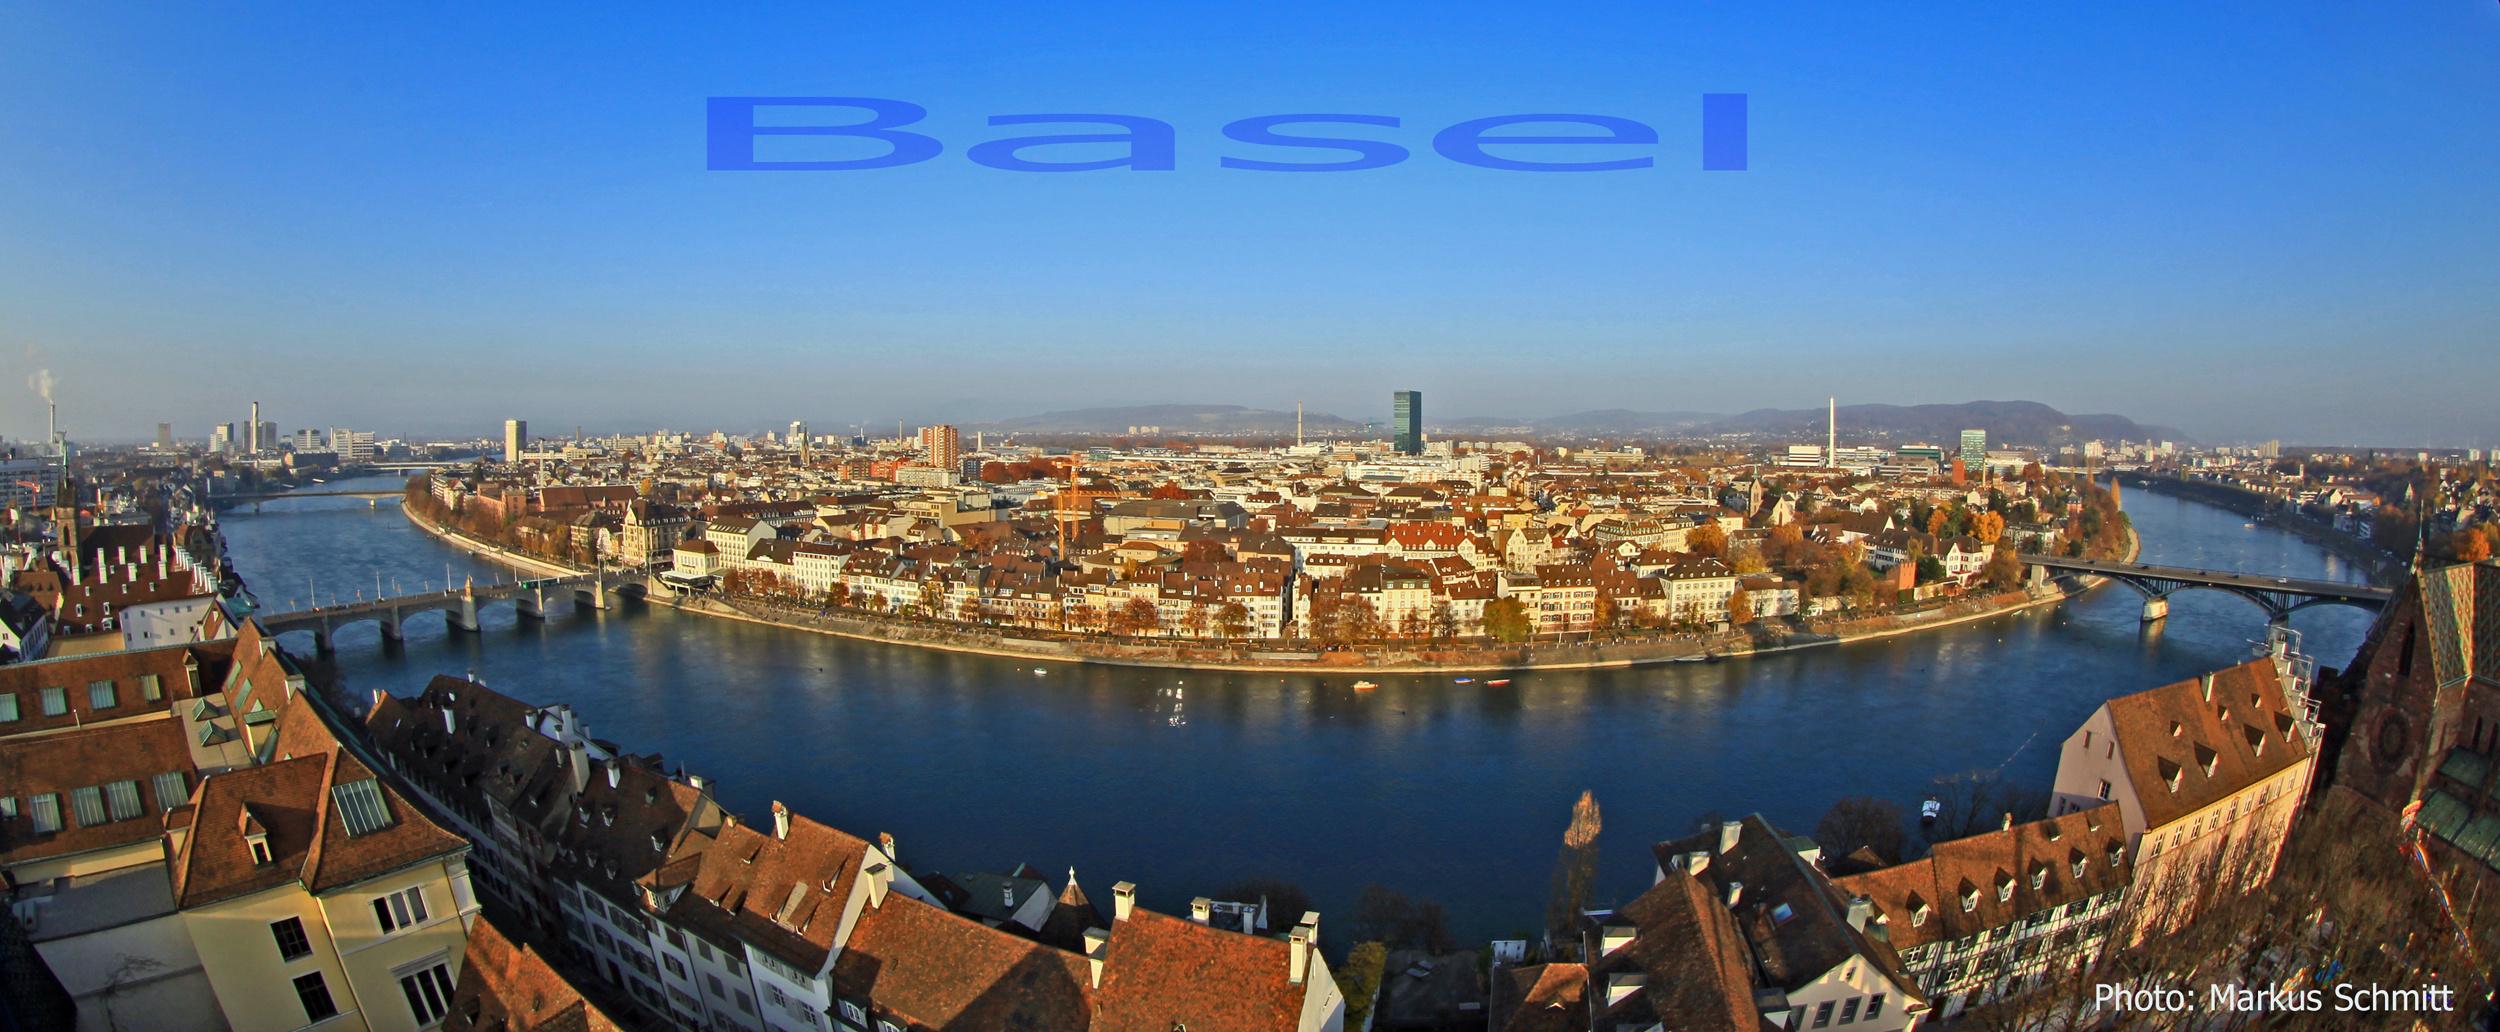 Panorama Aufnahme von Basel